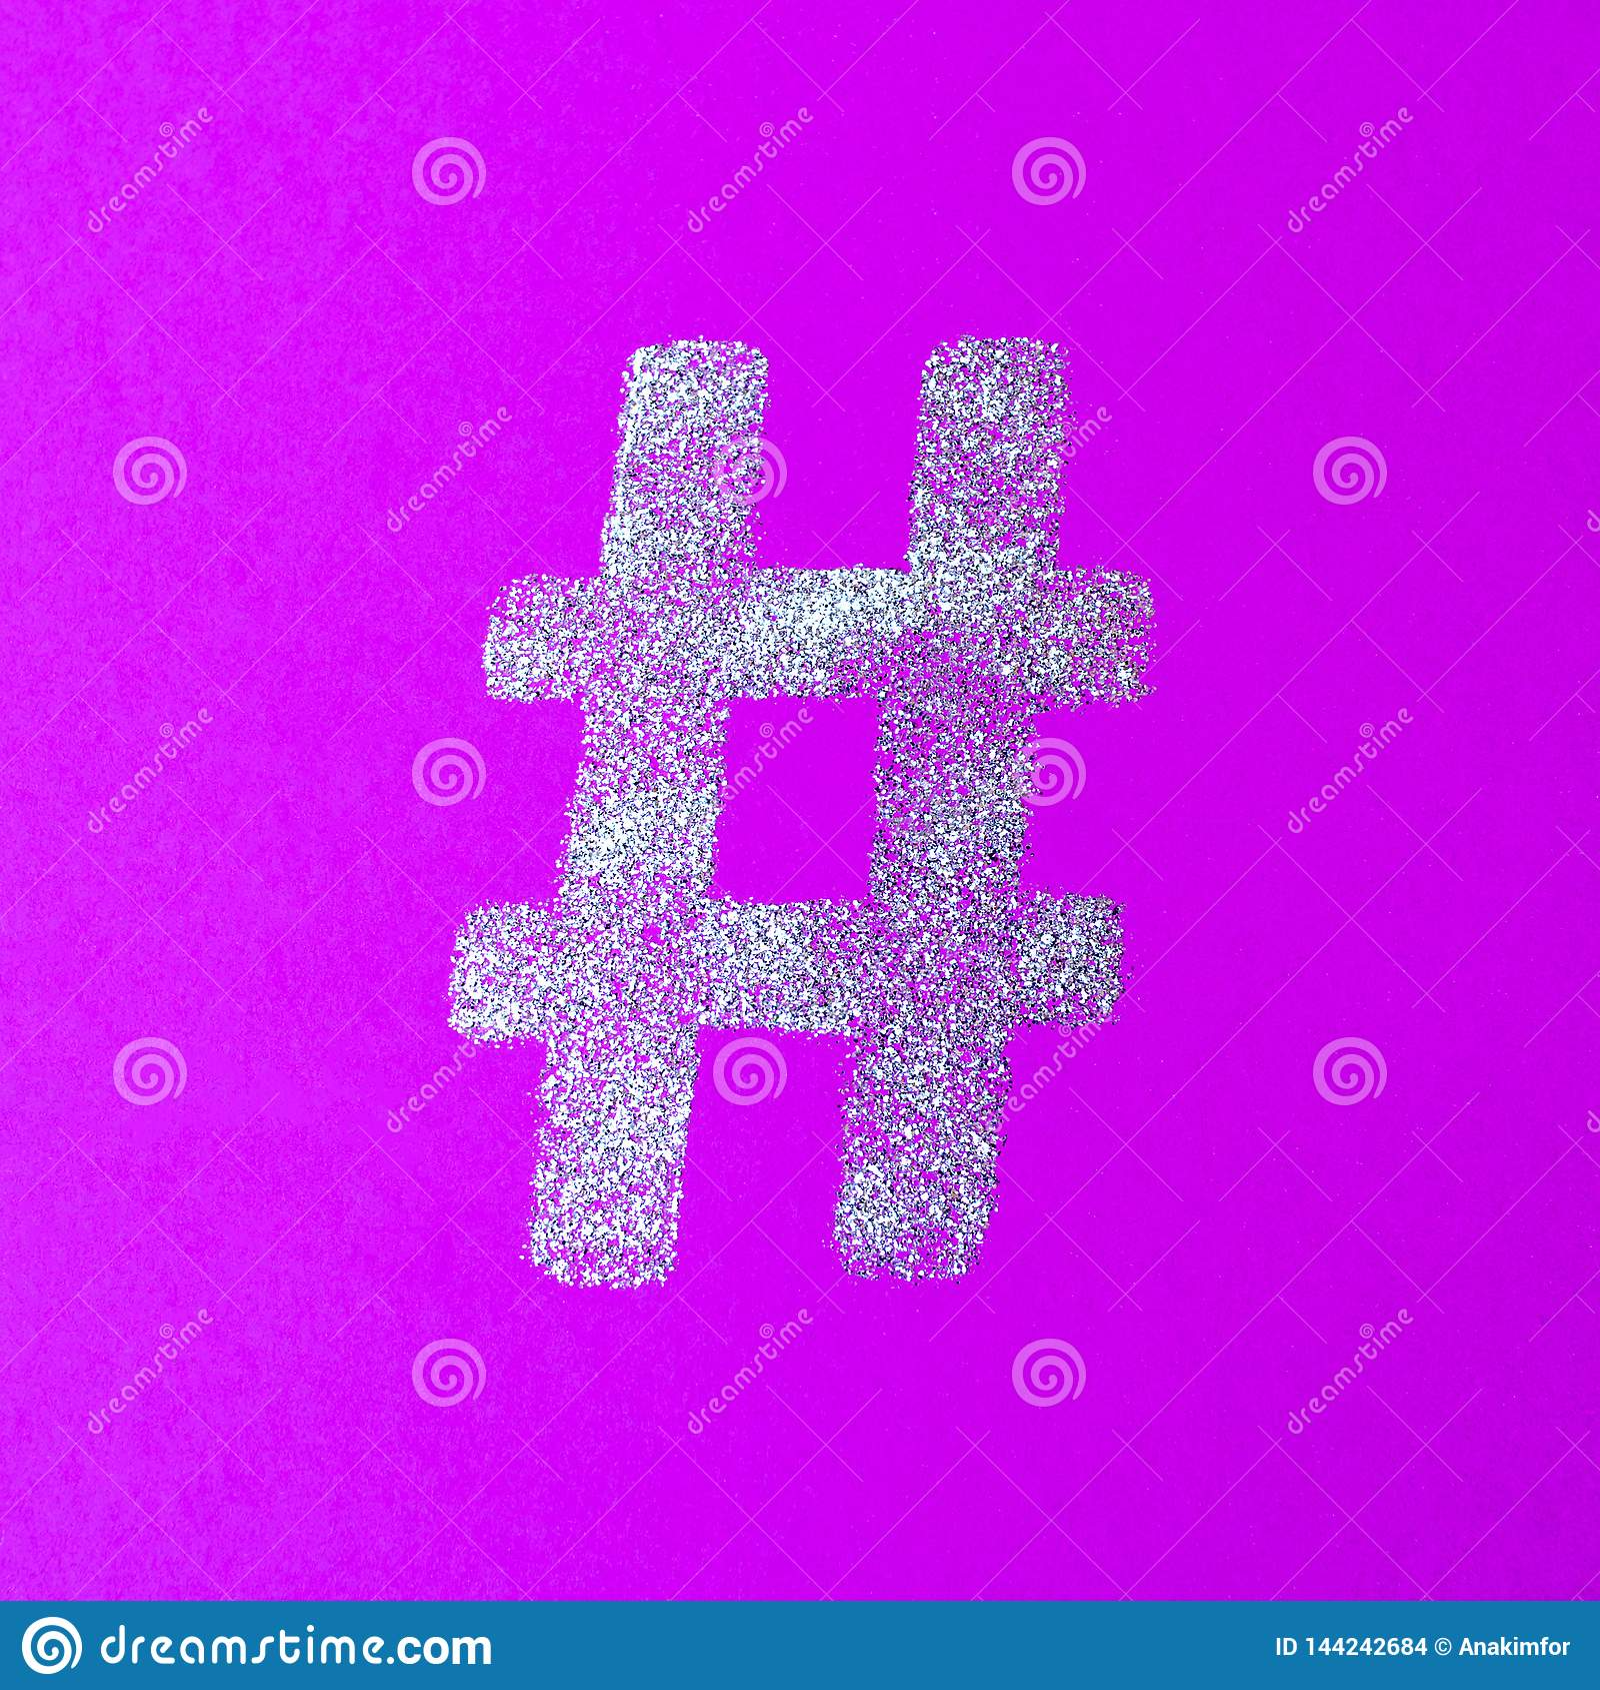 Hashtag sign. Silver hashtag symbol